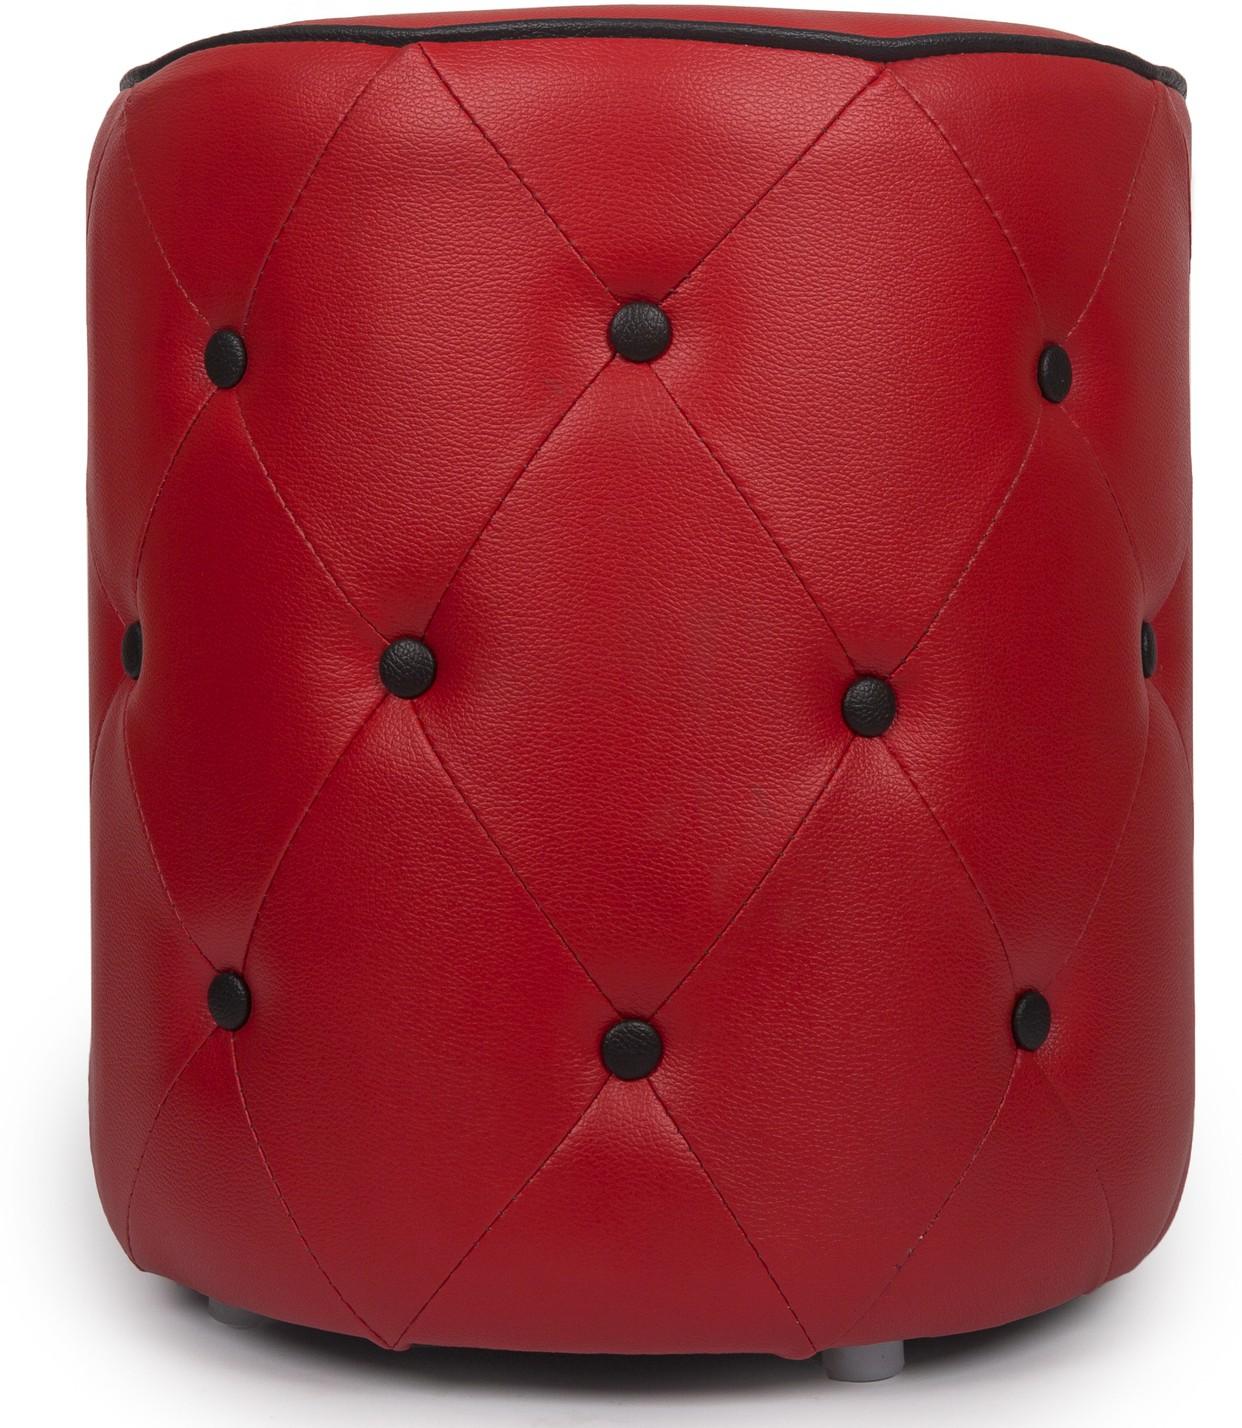 View Aadeshwar Enterprise Solid Wood Pouf(Finish Color - Red) Furniture (Aadeshwar Enterprise)